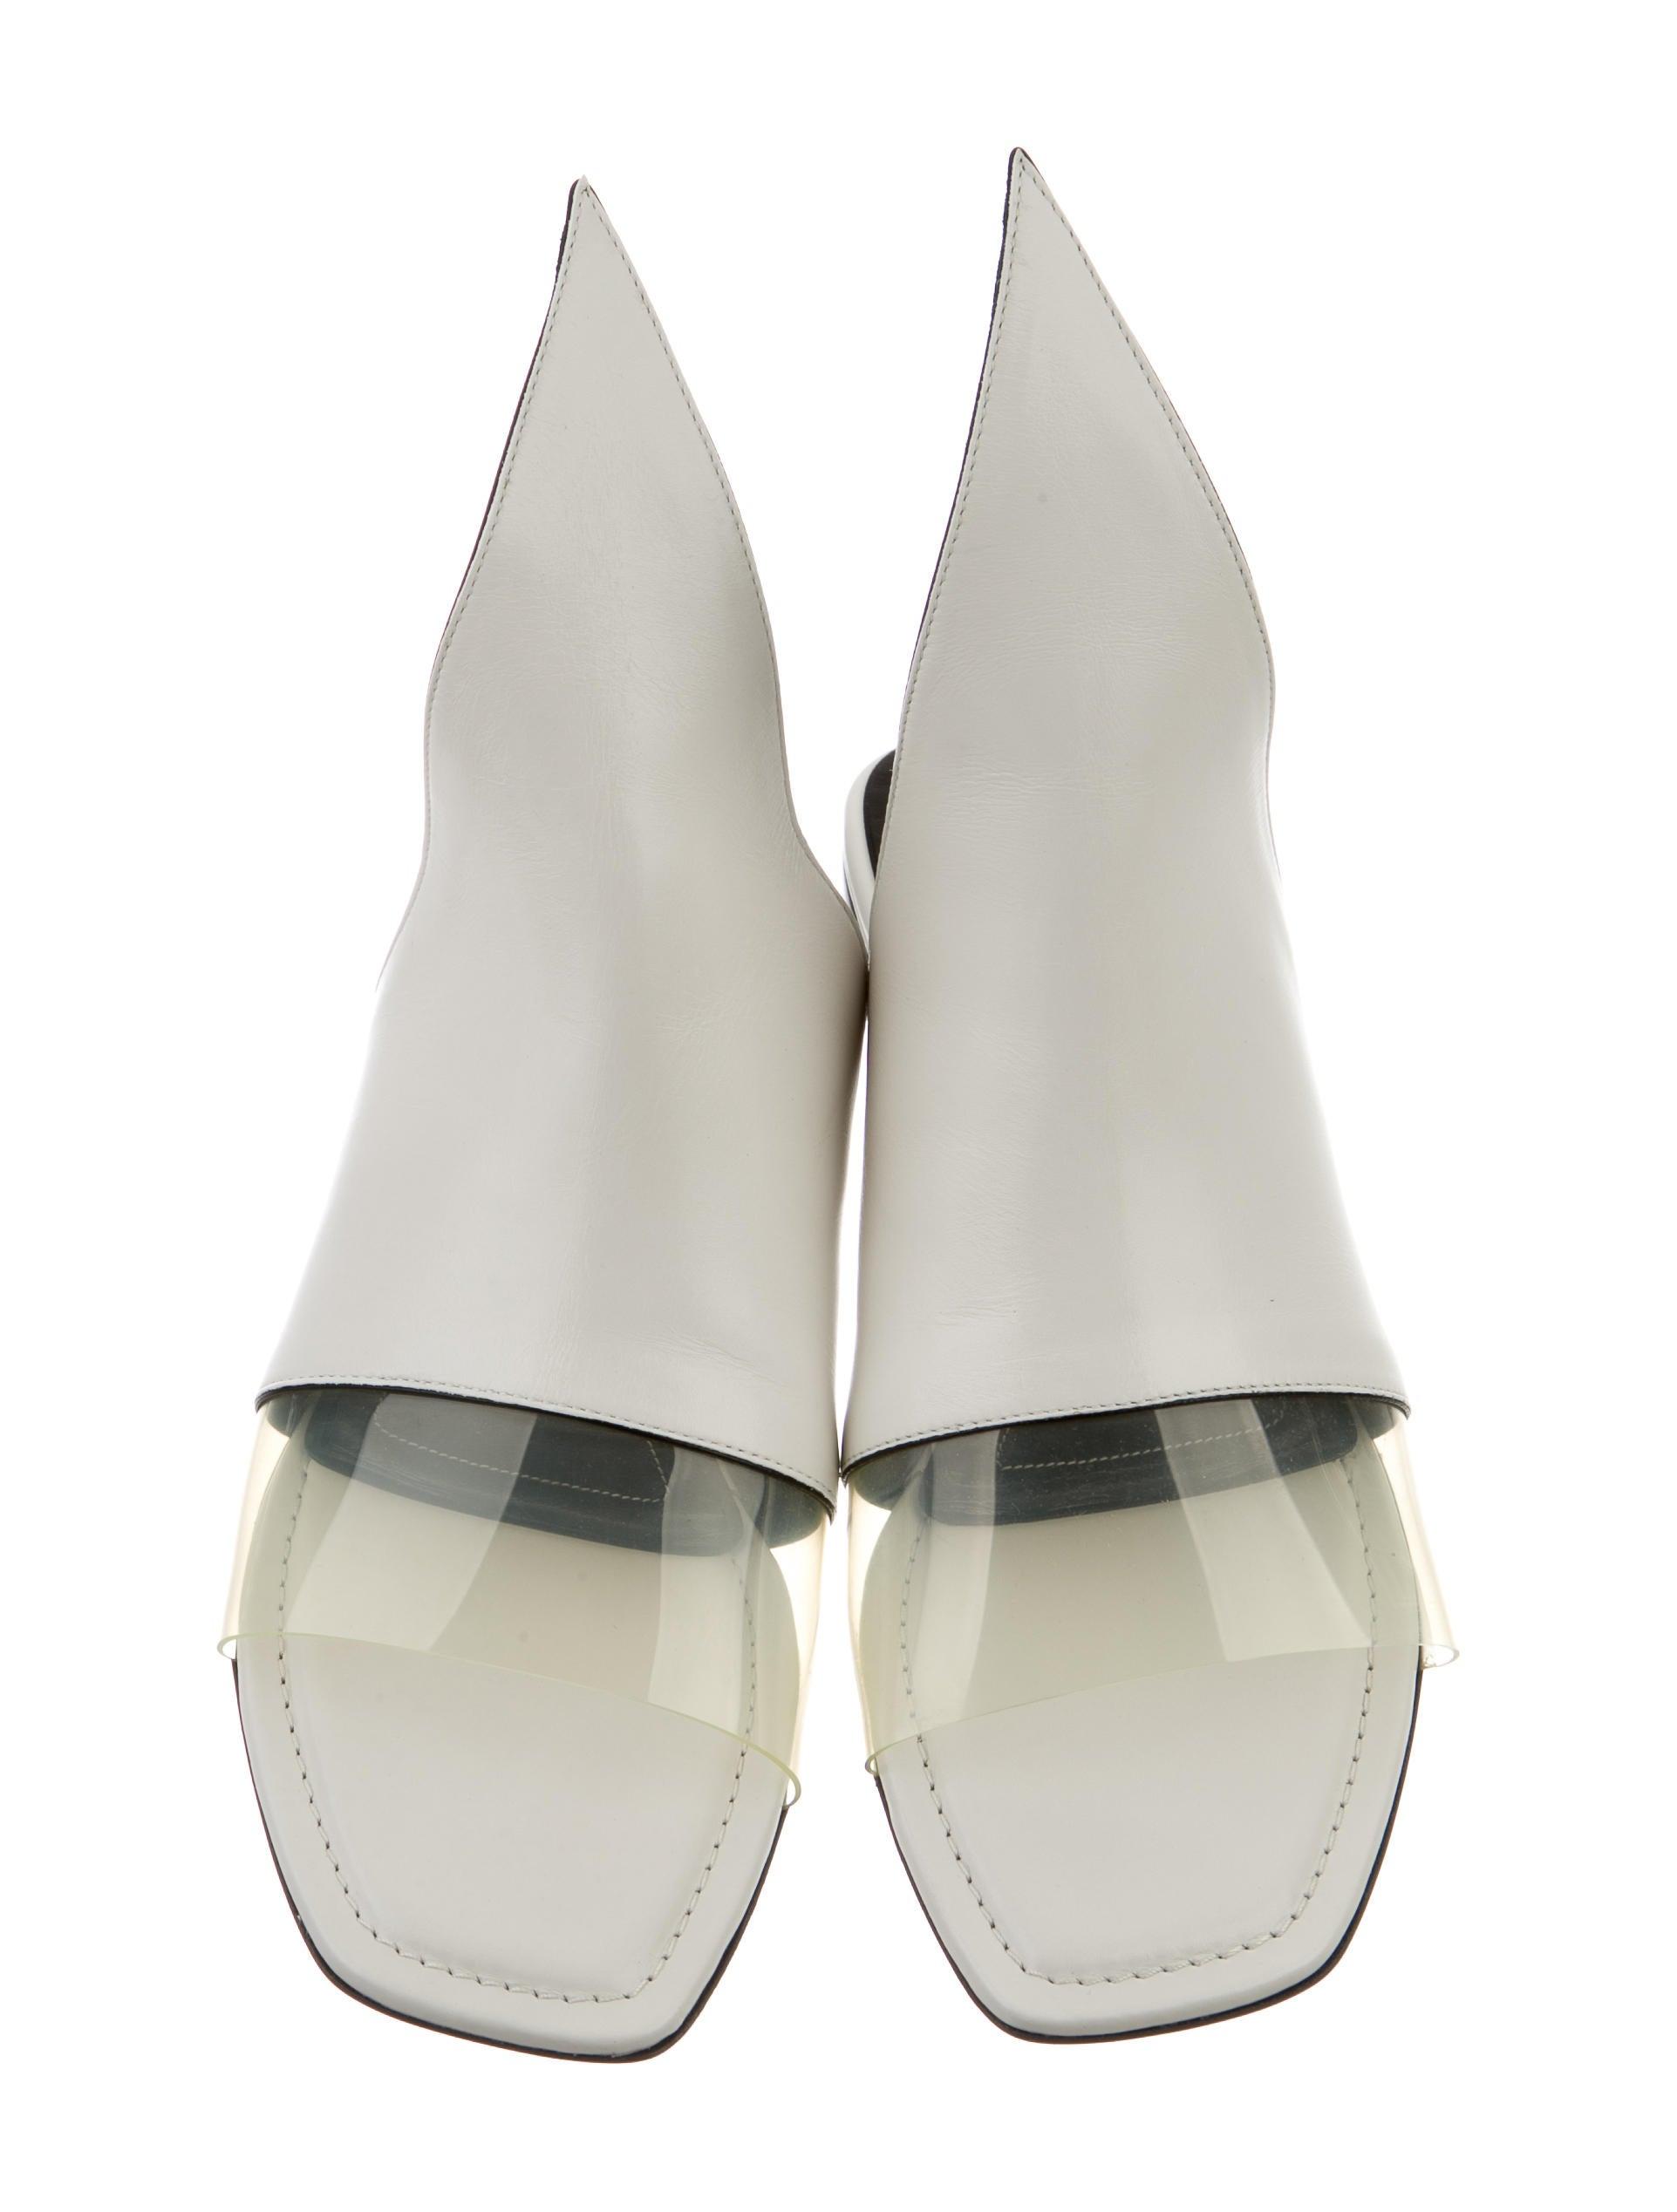 Balenciaga Shang Slide Sandals quality original buy cheap high quality 45LNsqves